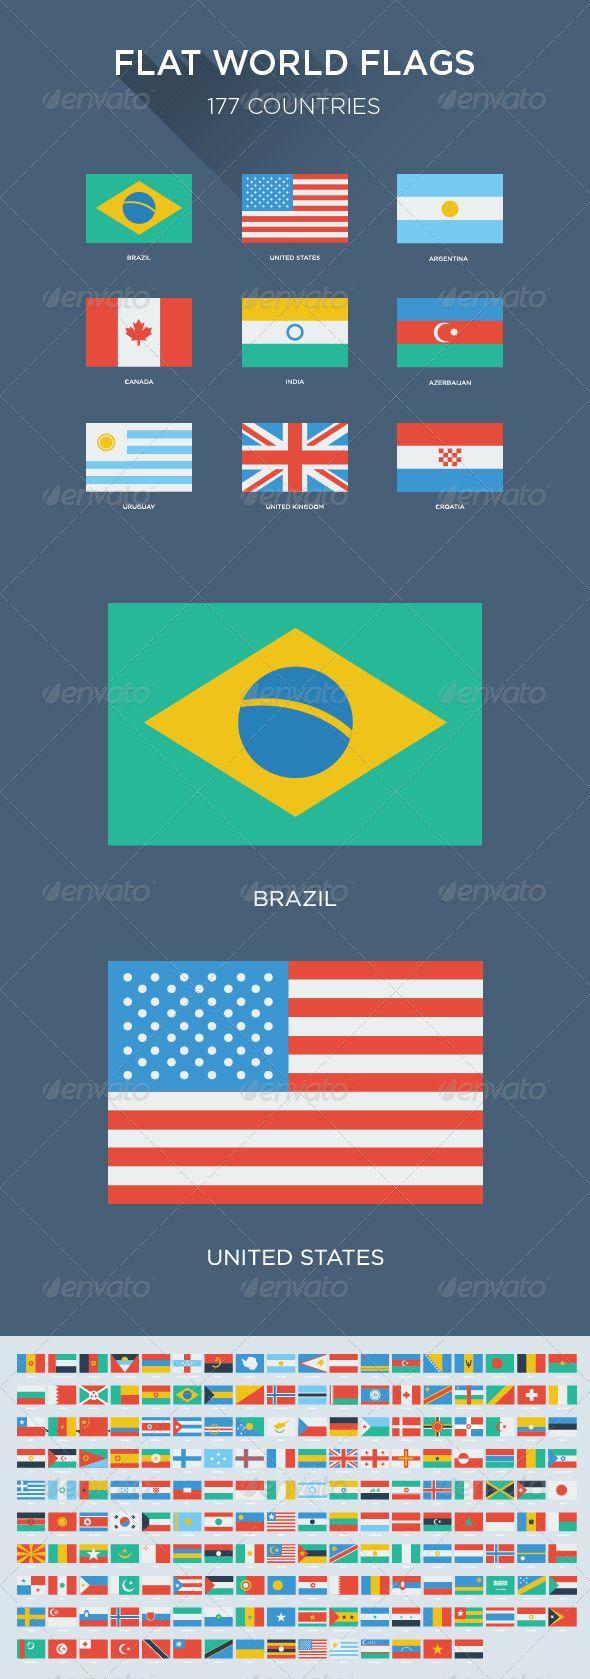 177 Flat World Flags